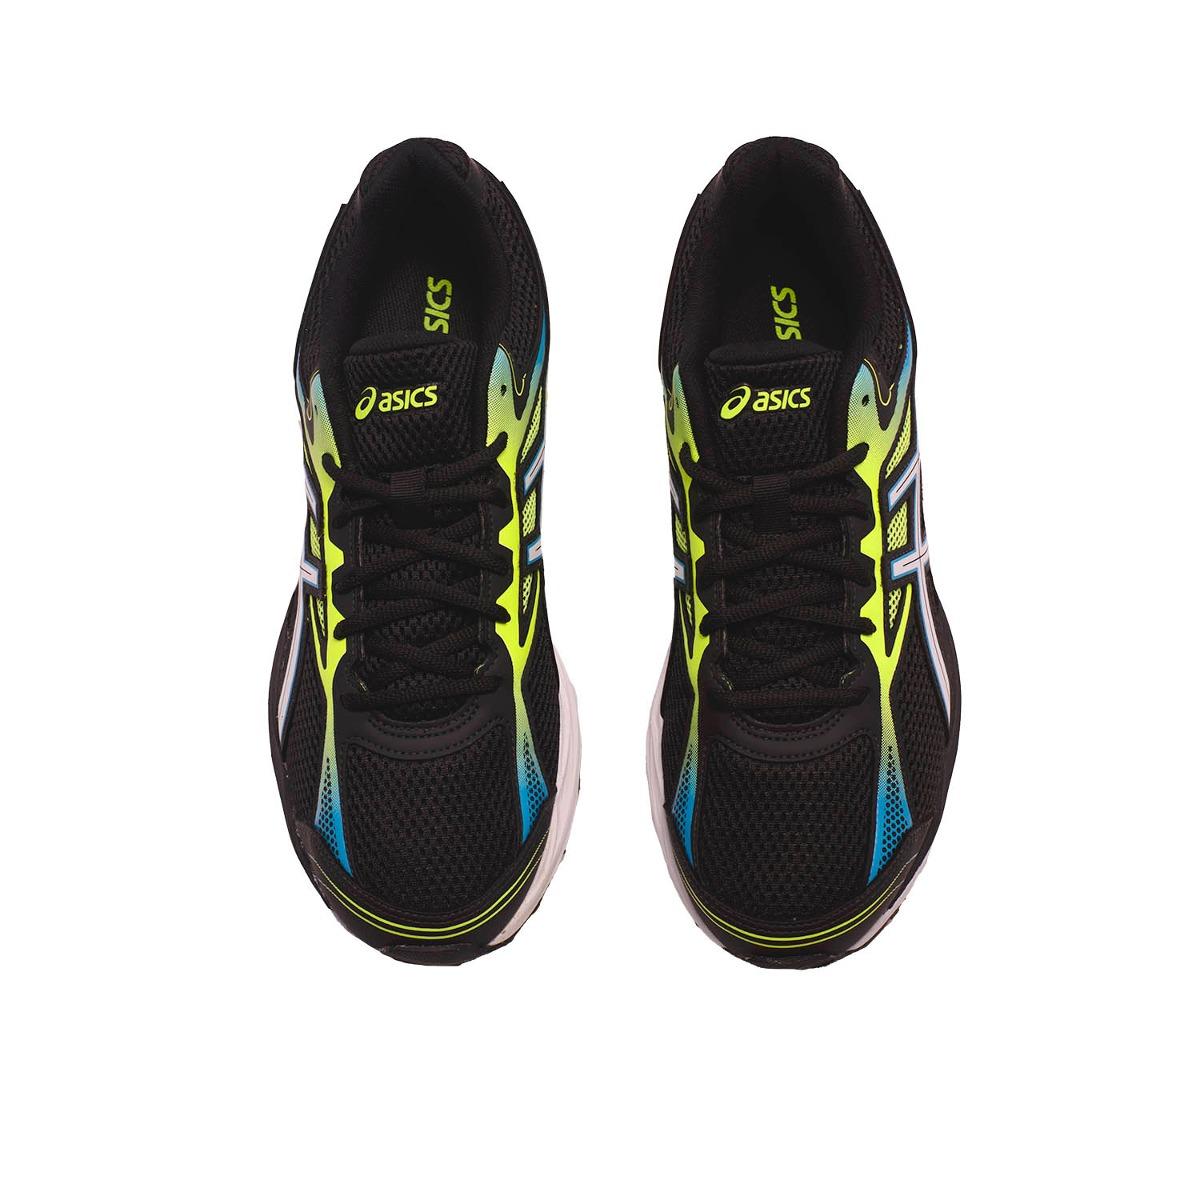 7b6acc7665d zapatillas asics gel equation 9-t022a9001- open sports. Cargando zoom.